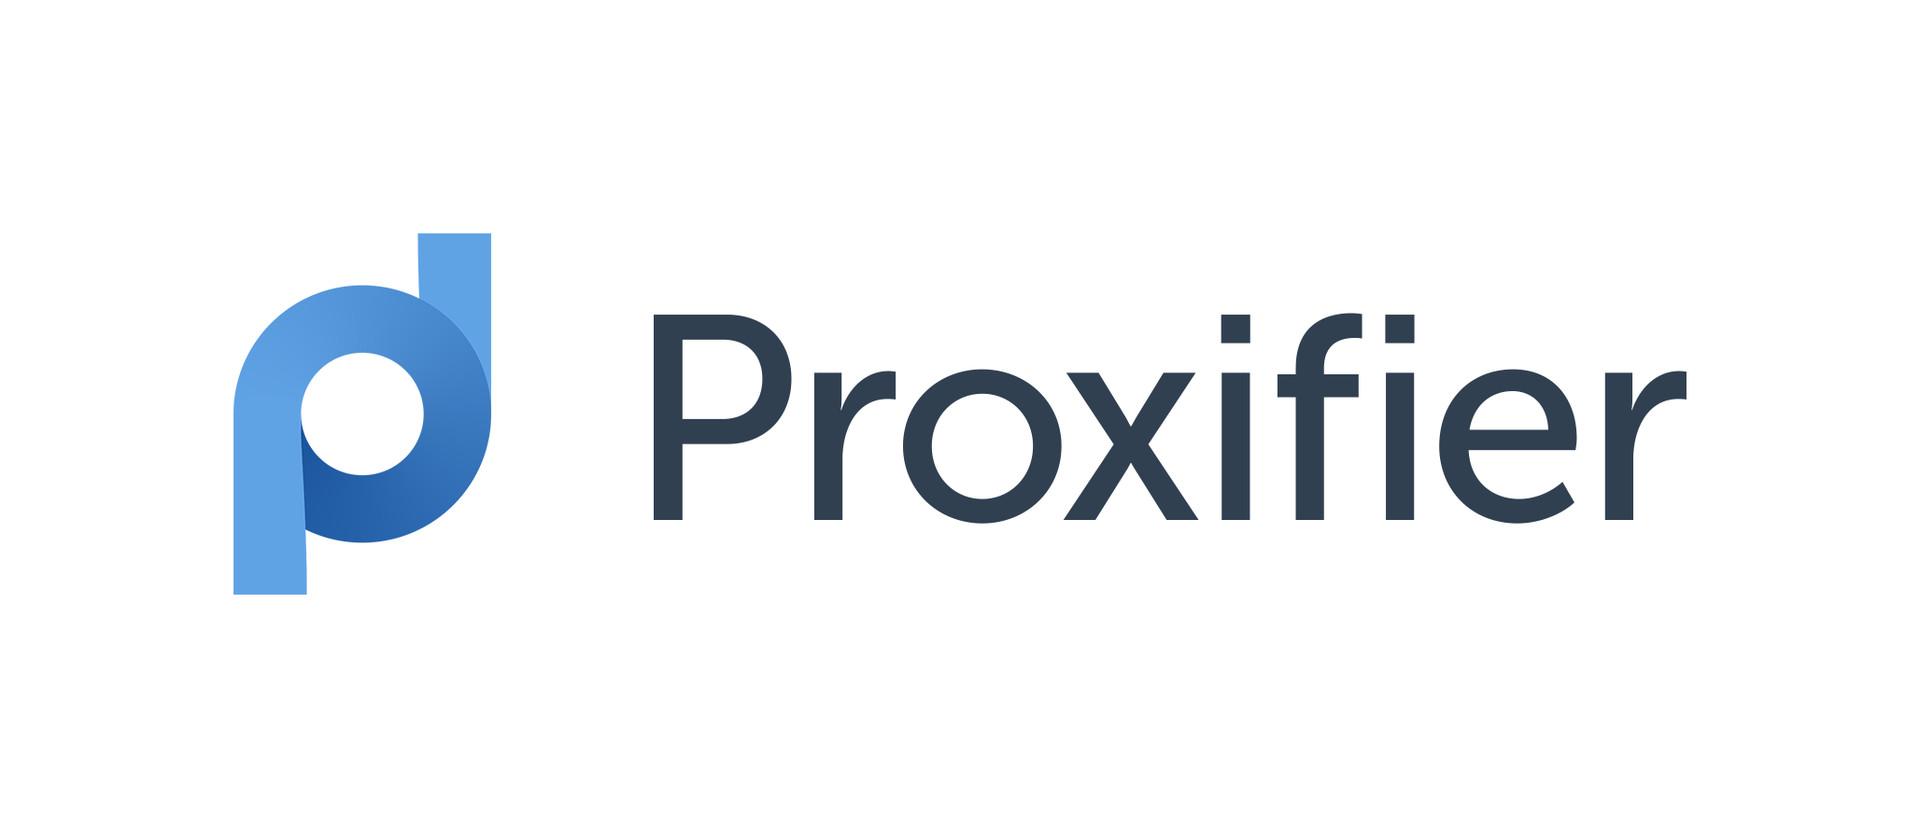 Инструкция: Легкая настройка прокси iPv4 и iPv6 в софте Proxifier за 30 секунд